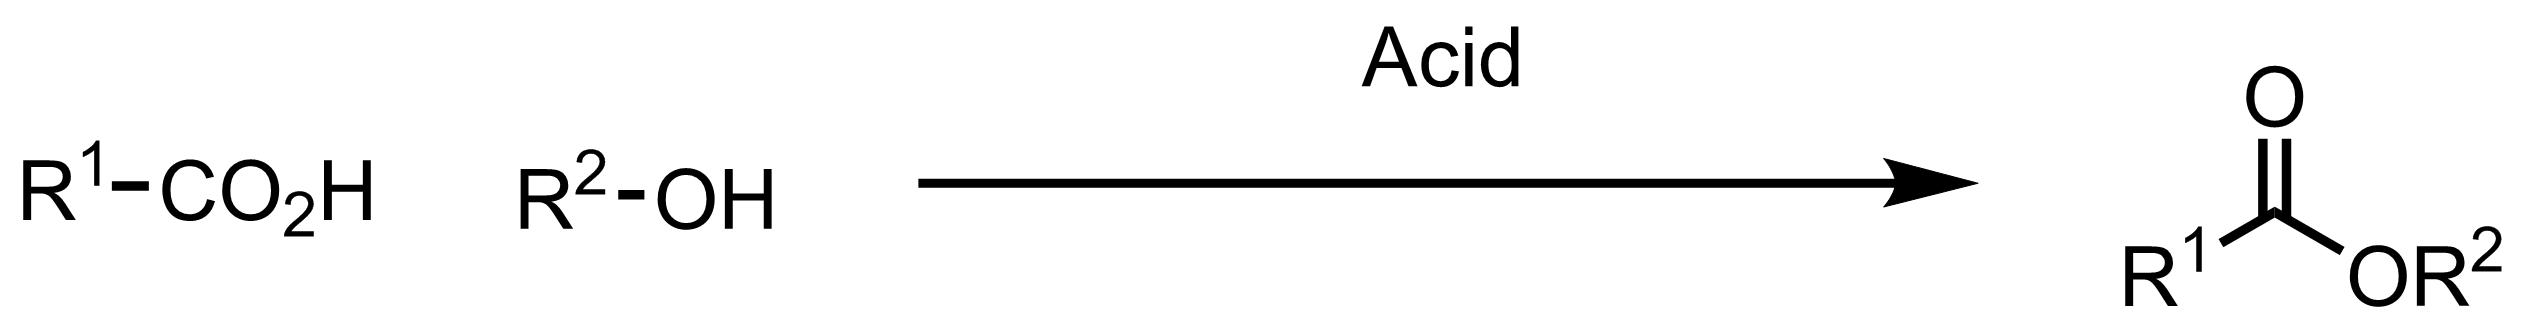 Schematic representation of the Fischer Esterification.